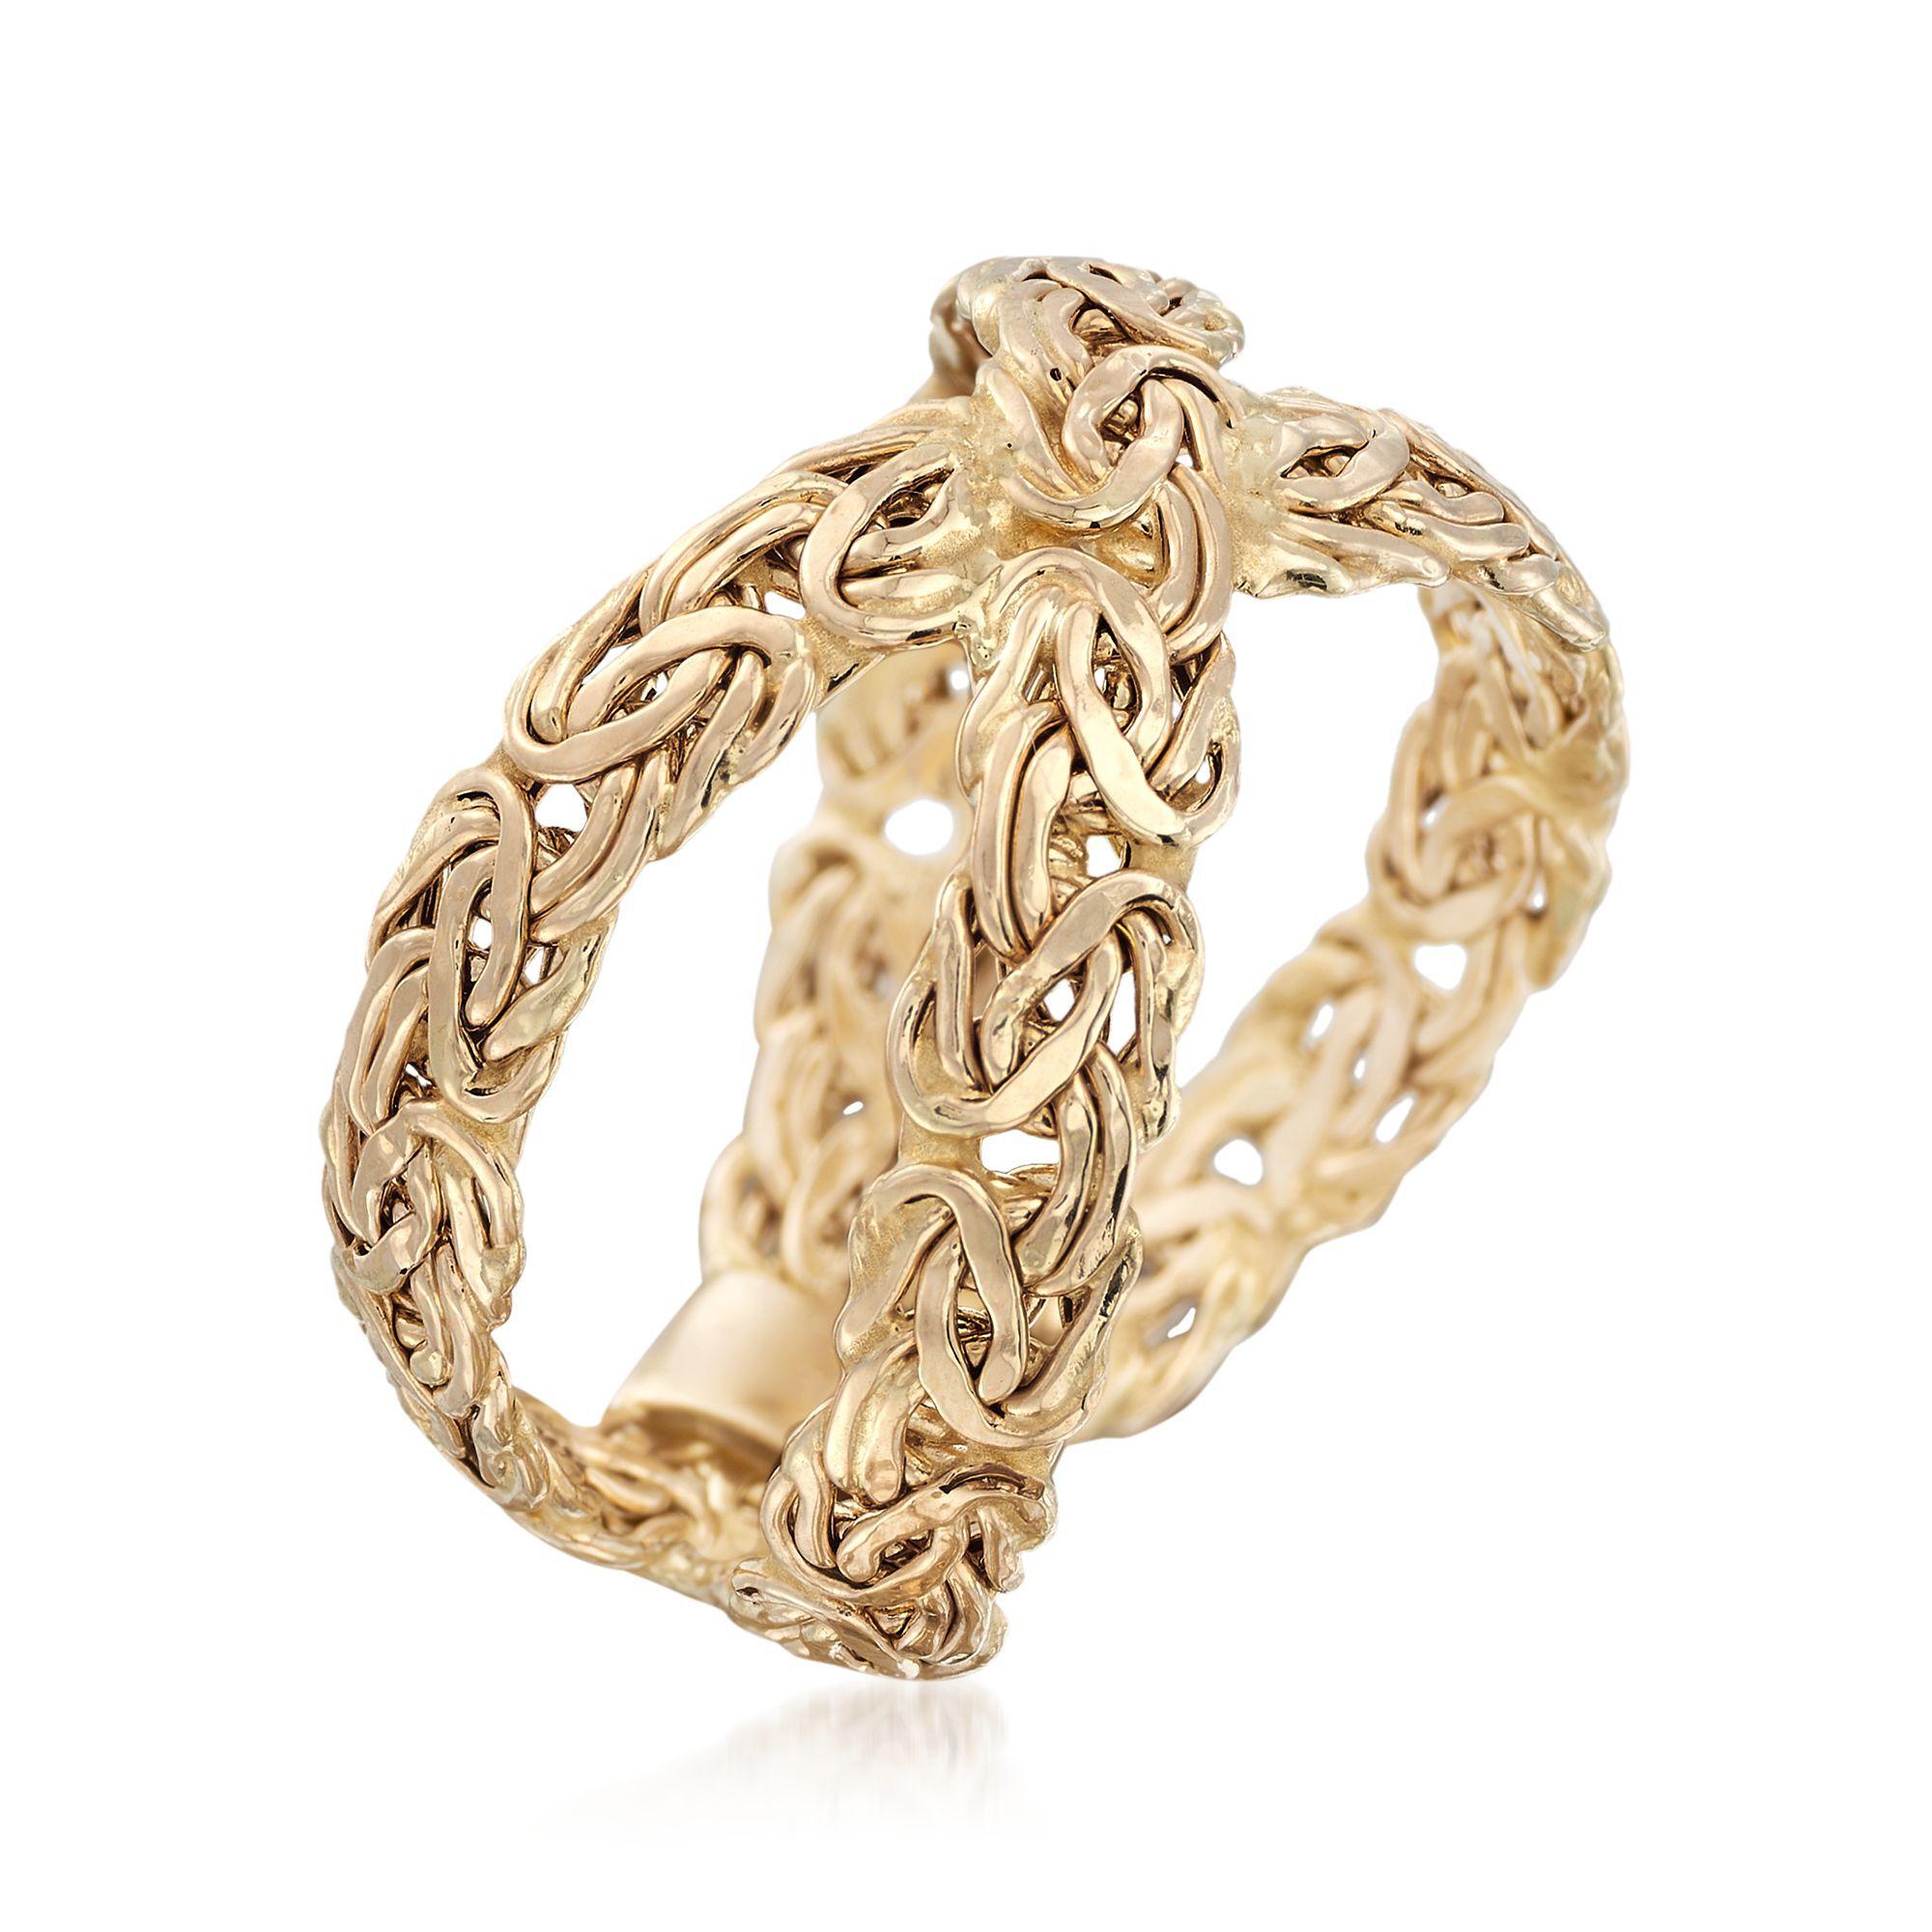 Ross-Simons 14kt Yellow Gold Byzantine Crisscross Ring